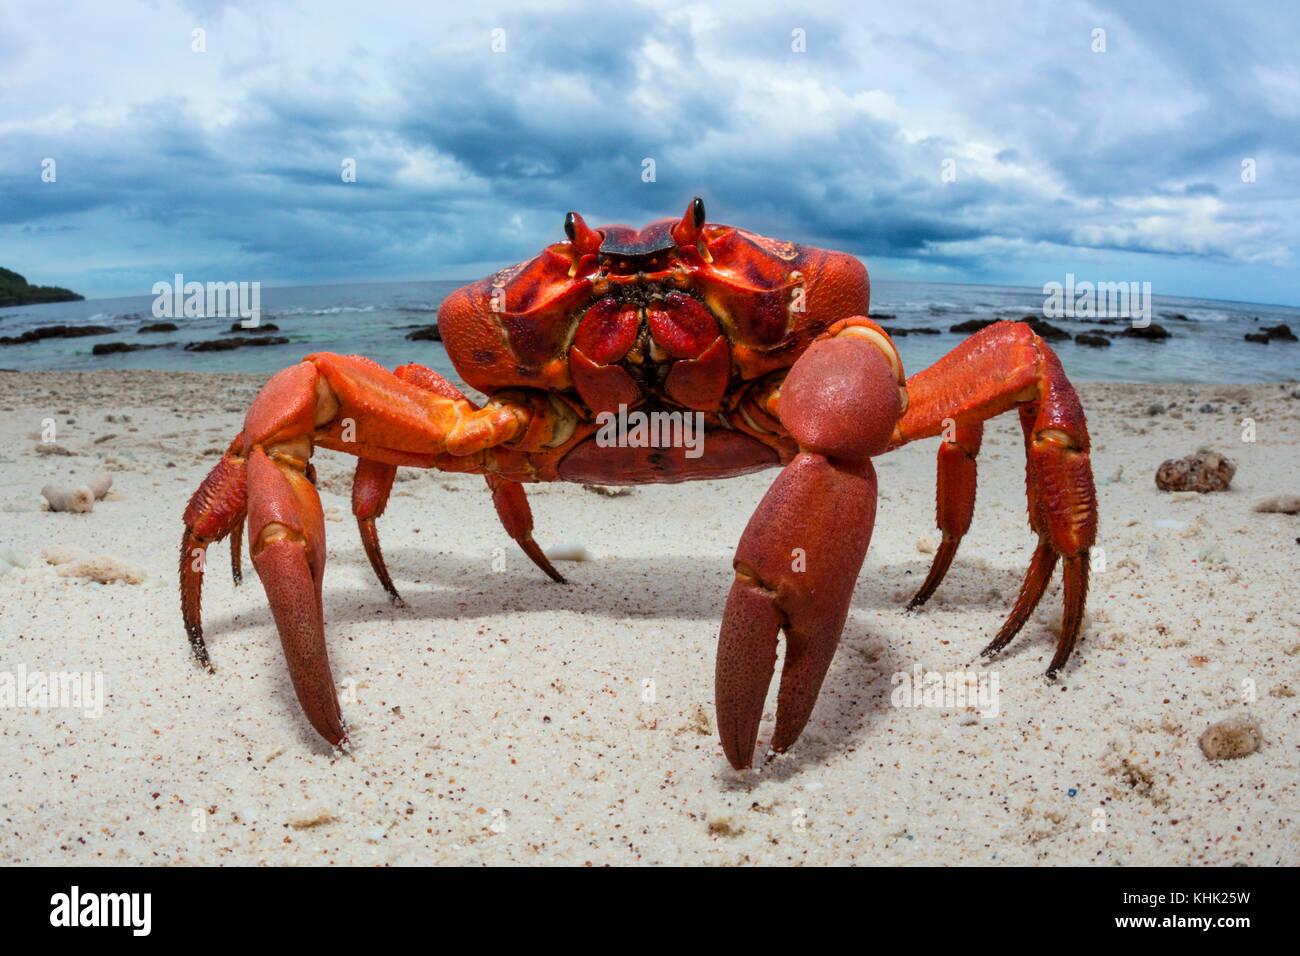 Christmas Island Red Crab at Ethel Beach, Gecarcoidea natalis, Christmas Island, Australia - Stock Image